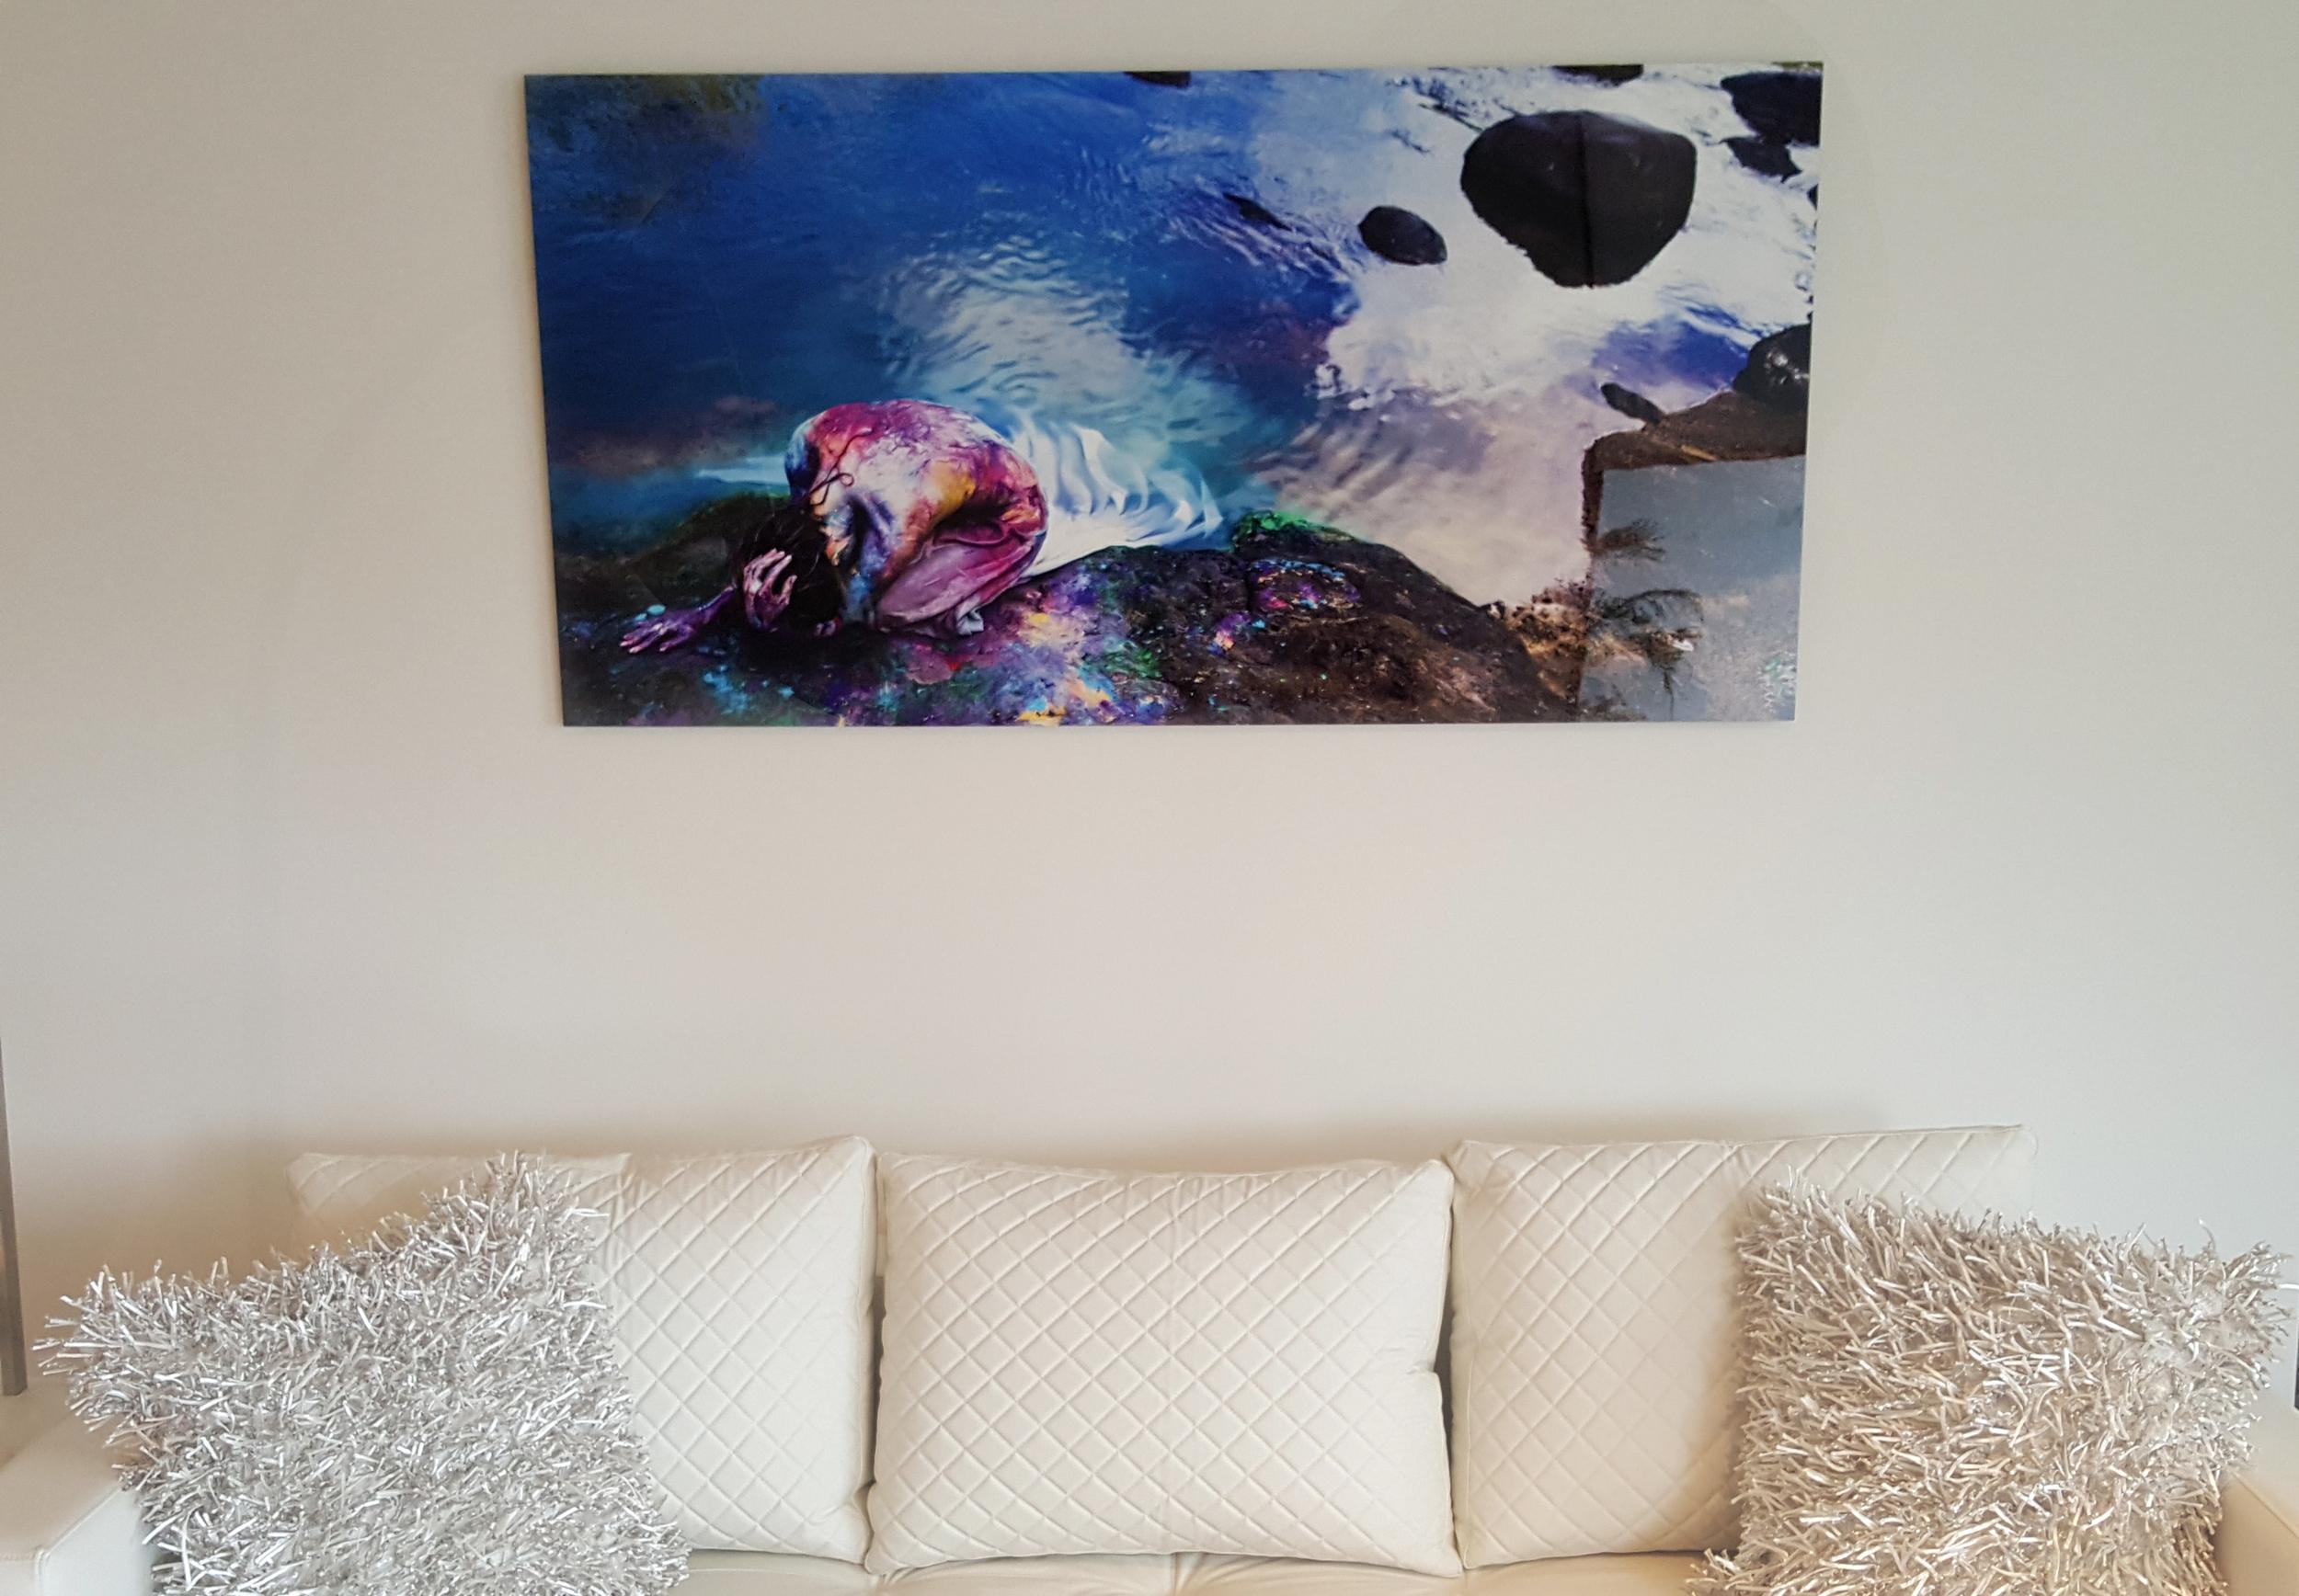 Art on walls